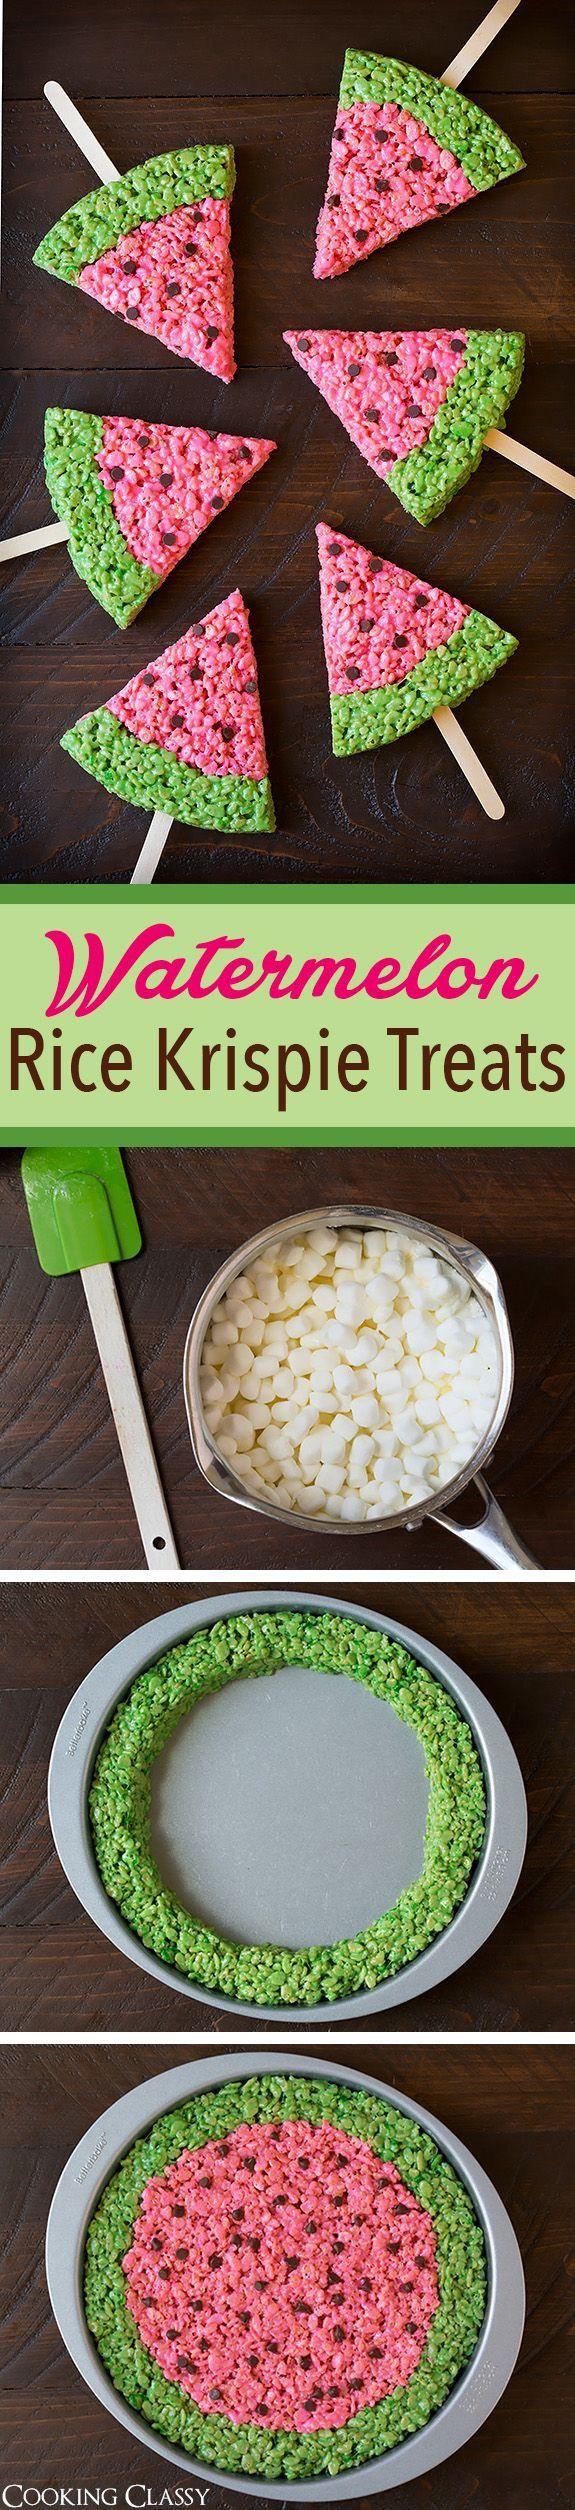 Watermelon Rice Krispies Treats | Posted by DebbieNet.com